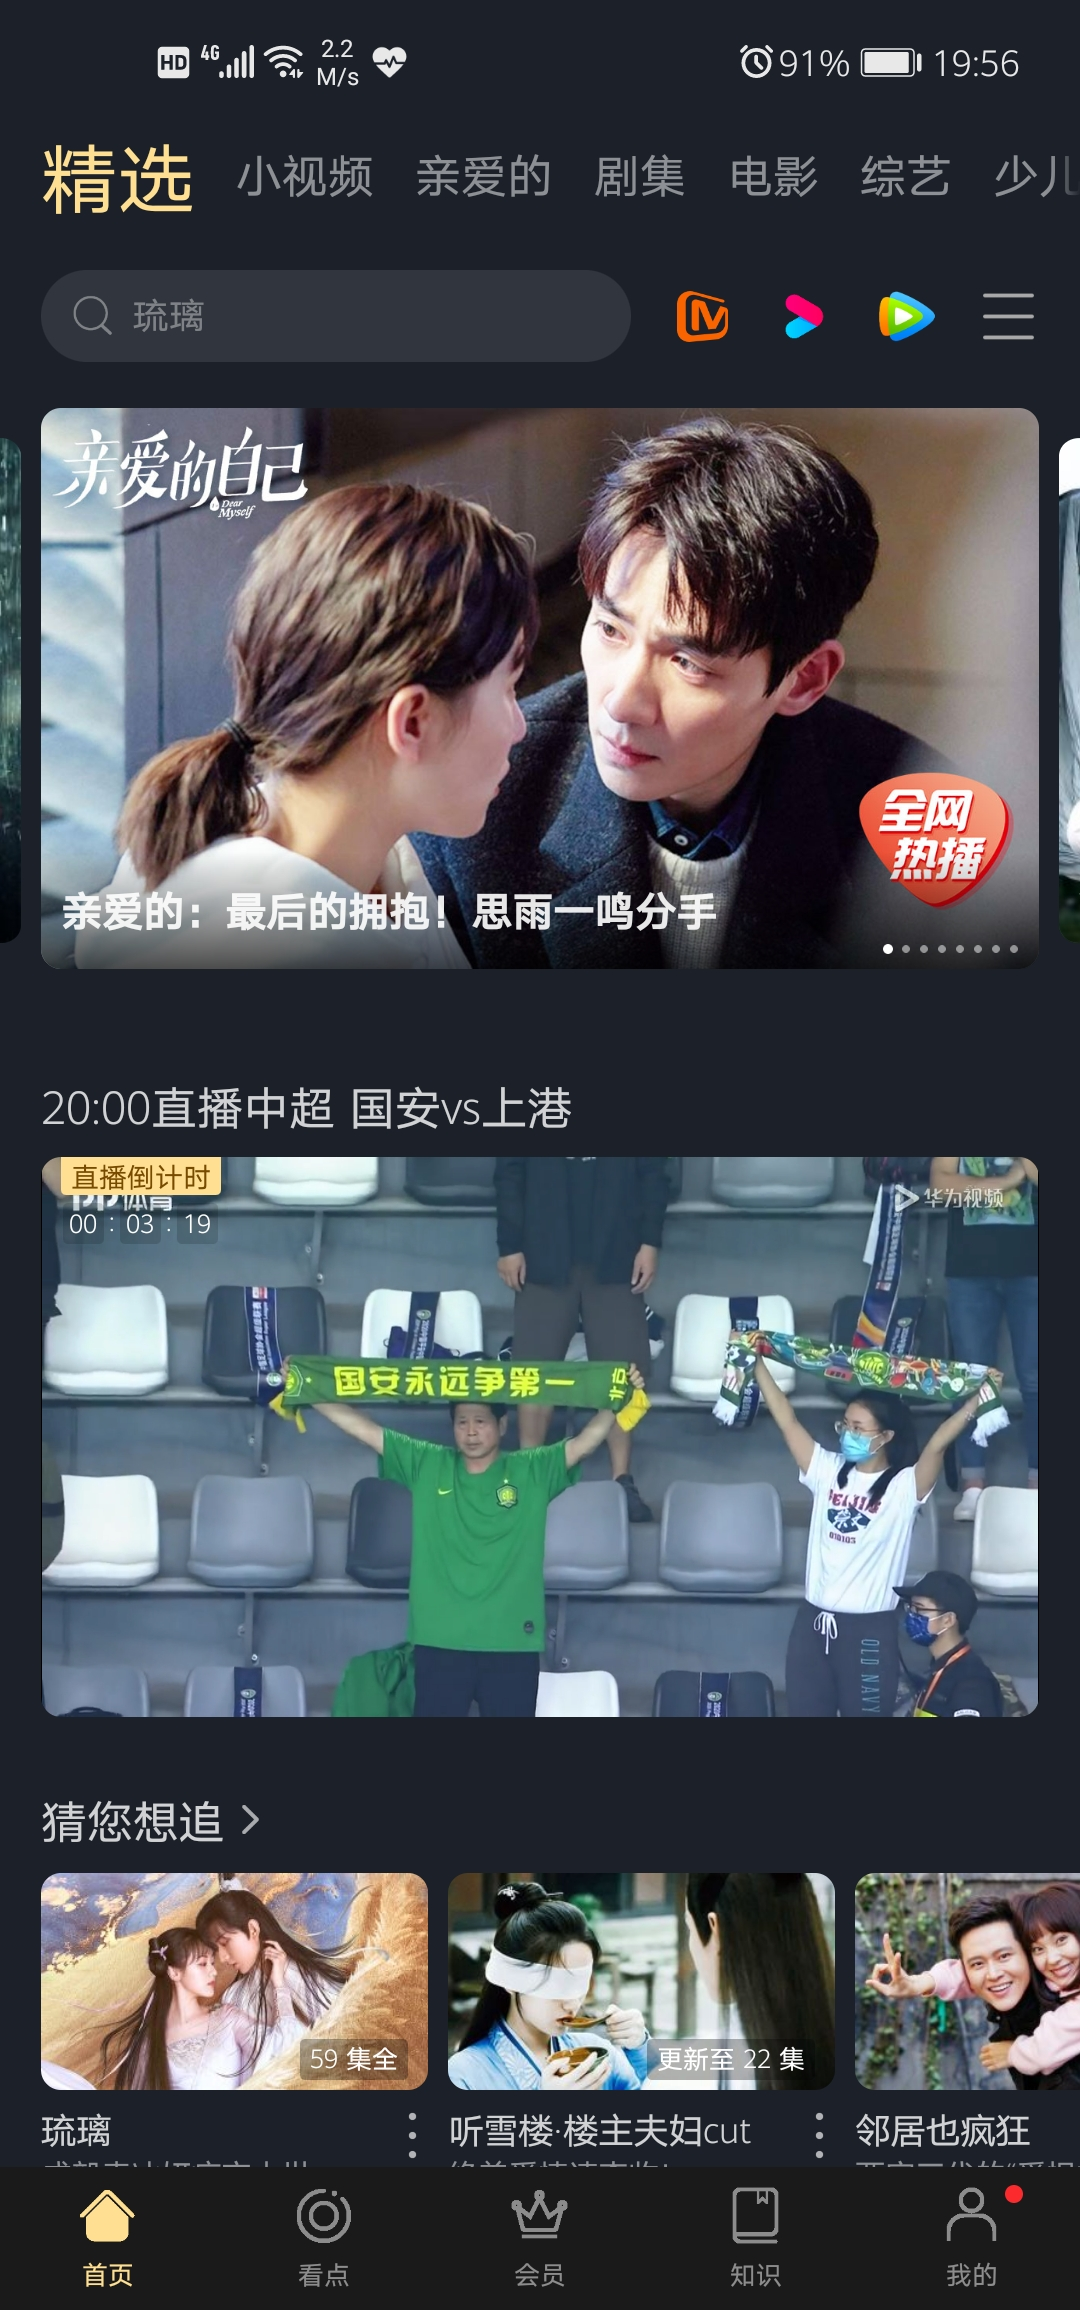 Screenshot_20200925_195642_com.huawei.himovie.jpg